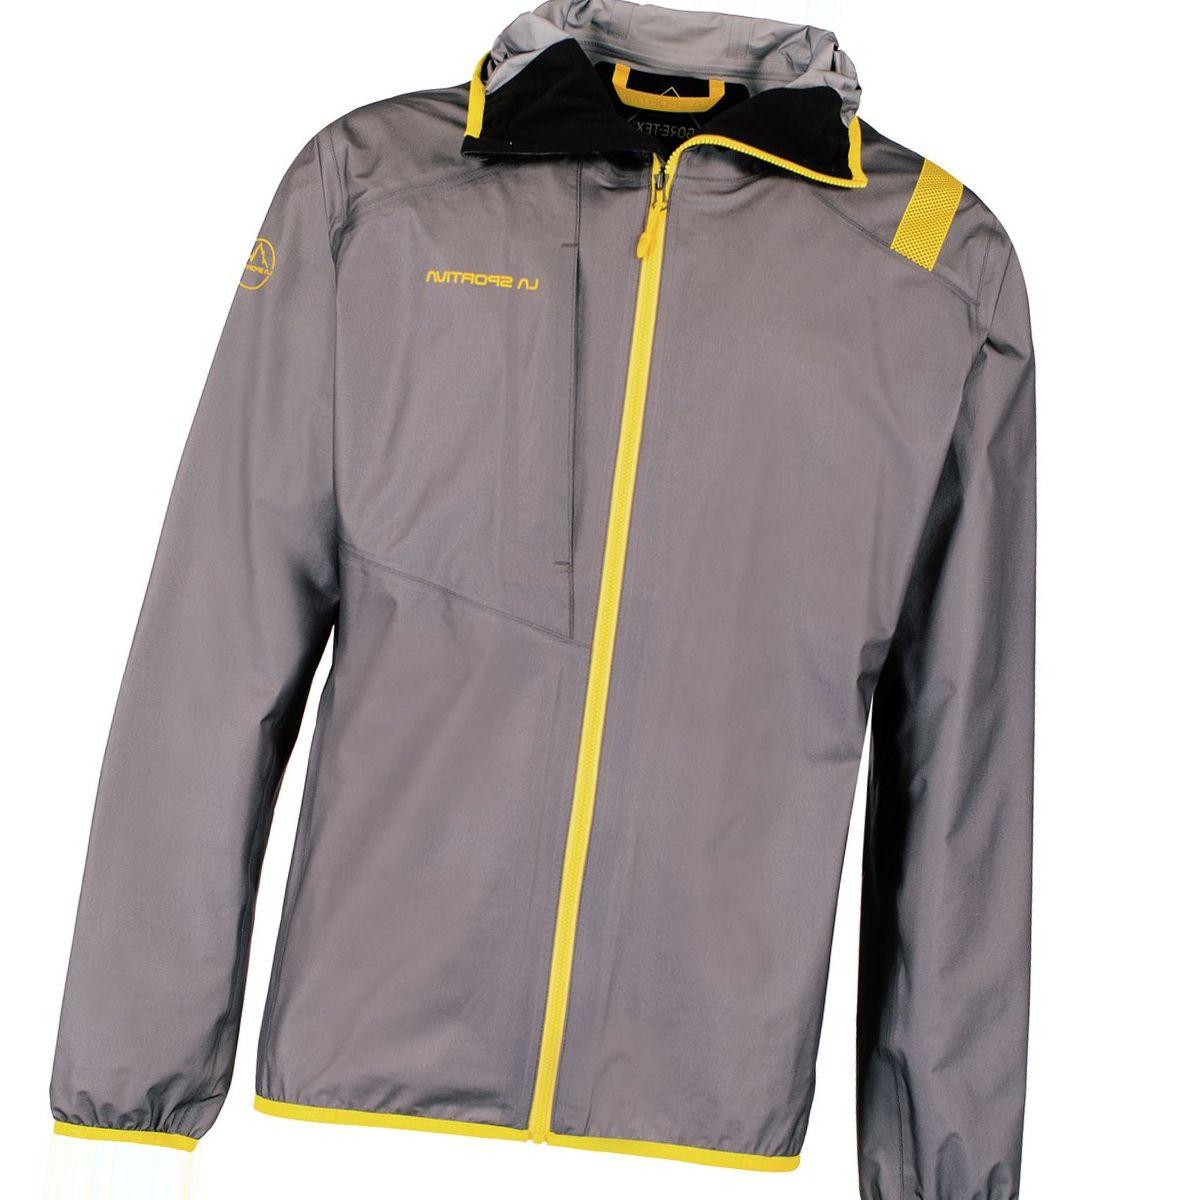 La Sportiva Odyssey GTX Jacket - Men's